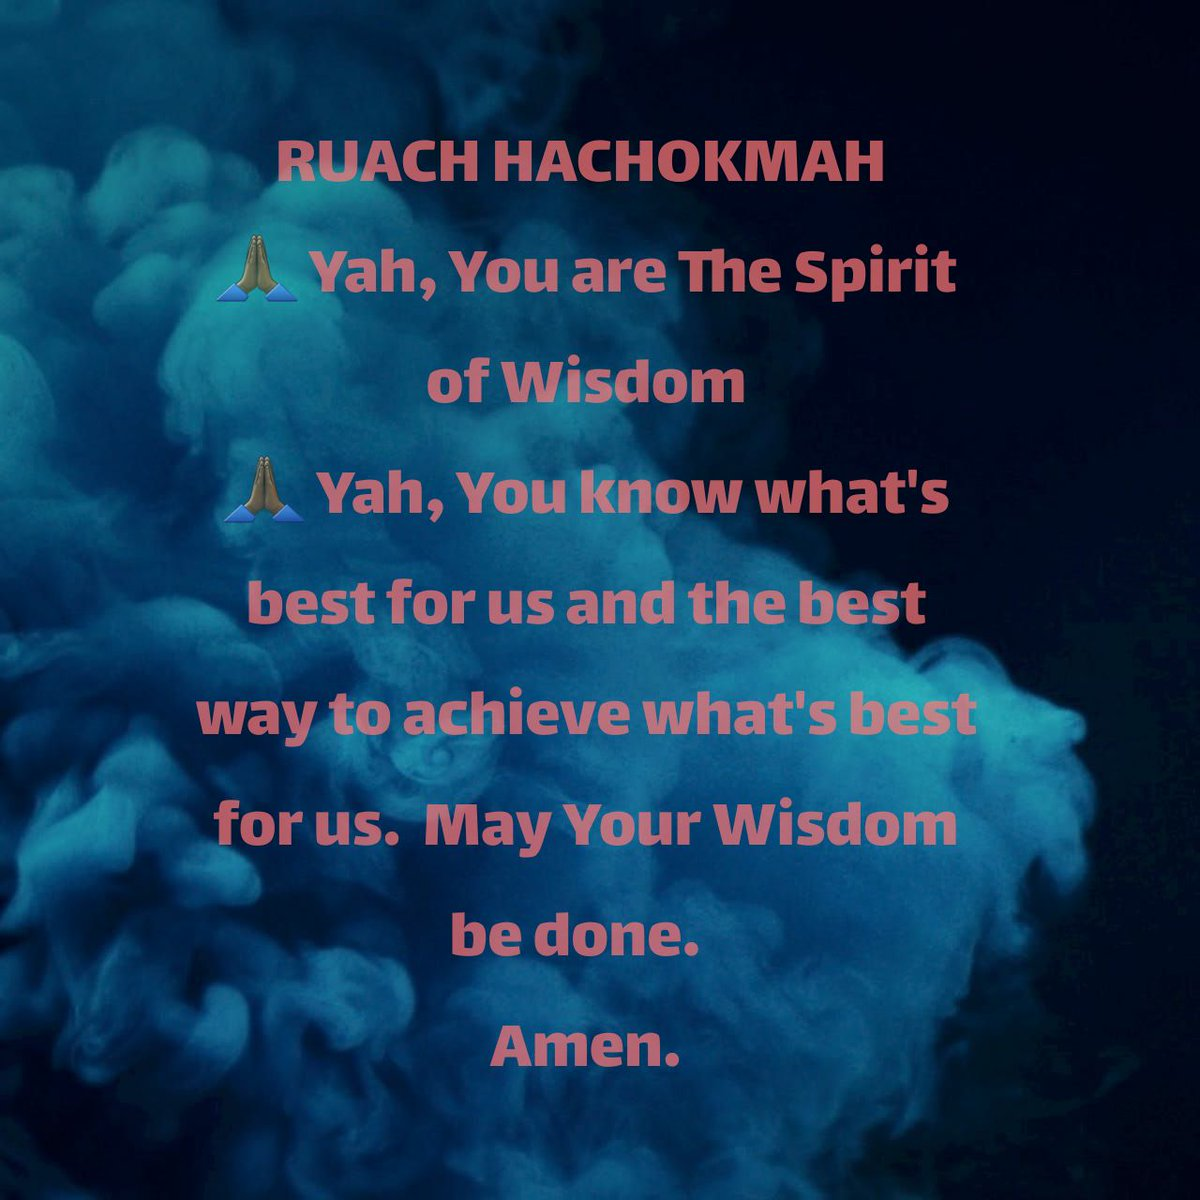 RUACH HACHOKMAH #tuesdaymotivations  #tuesdayvibe  #GodMorningTuesday  #YahMorningTuesday